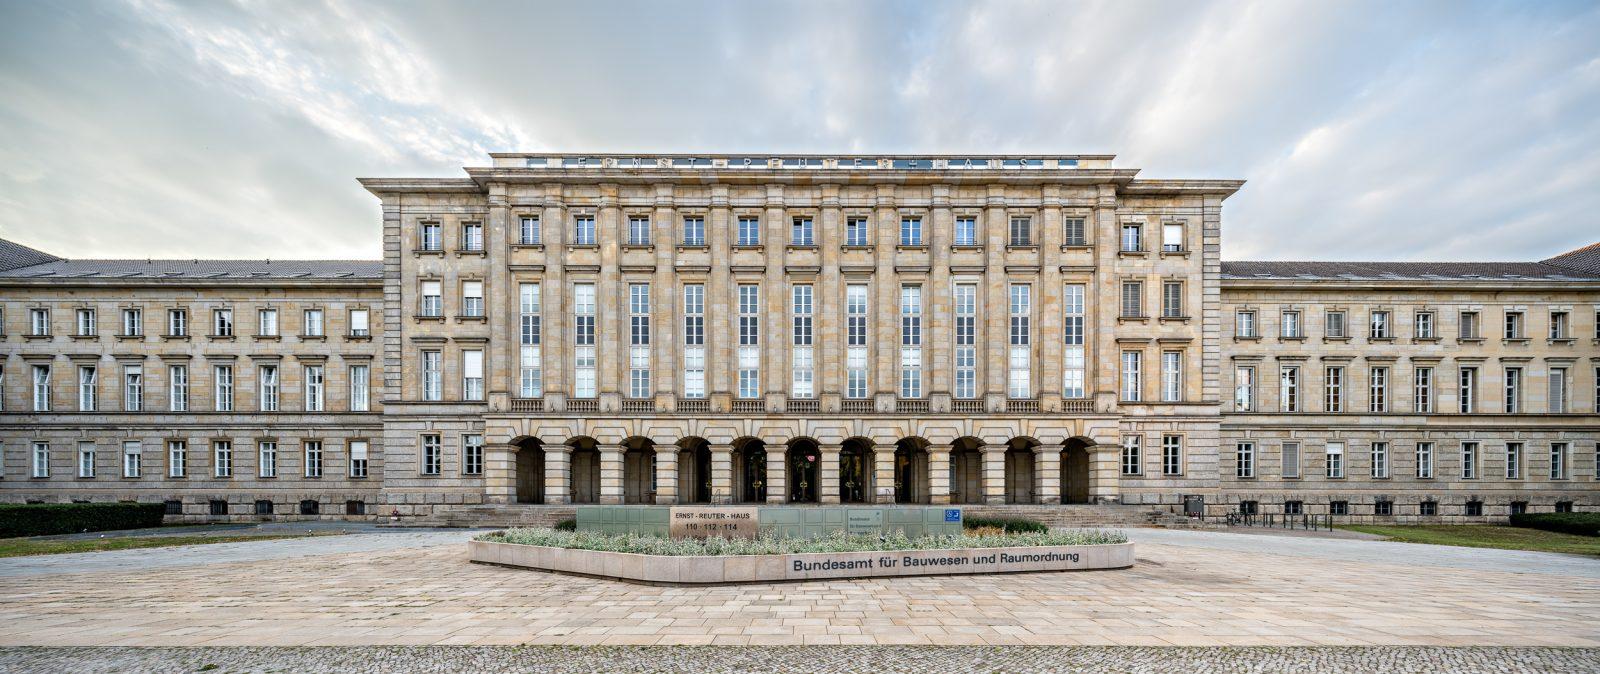 Ernst-Reuter-Haus, Berlin